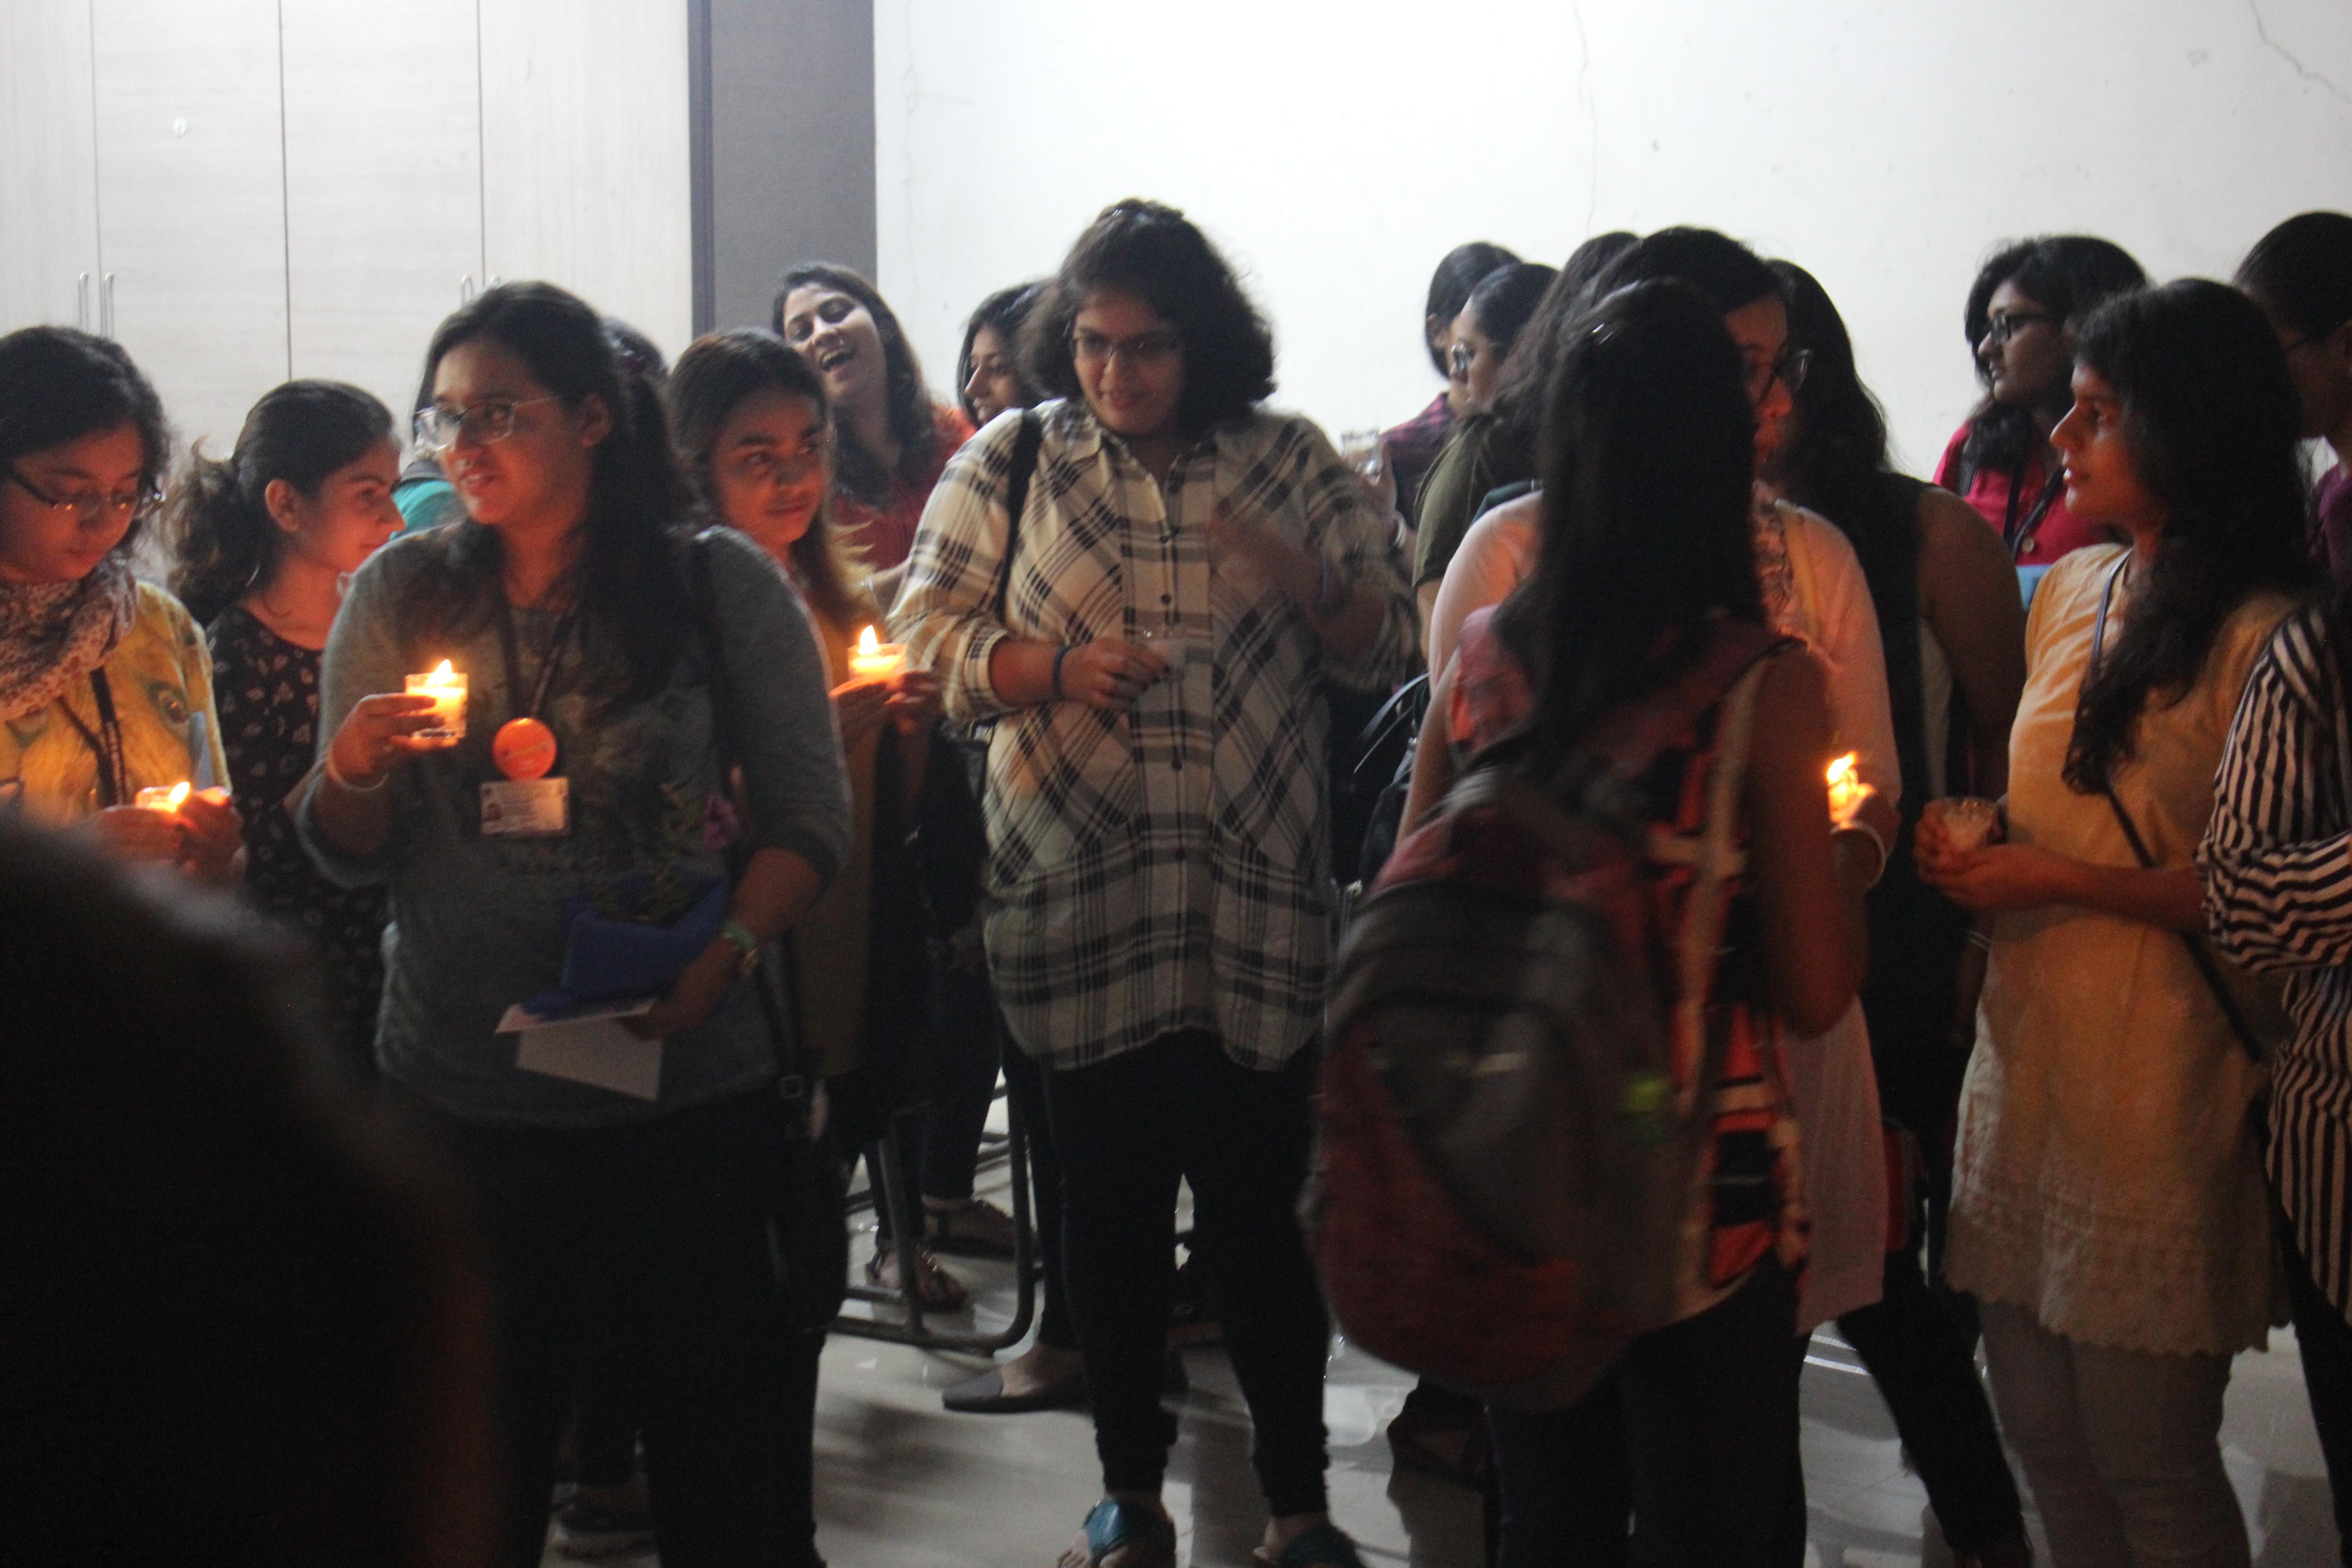 International Survivors of Suicide Loss Day 2017